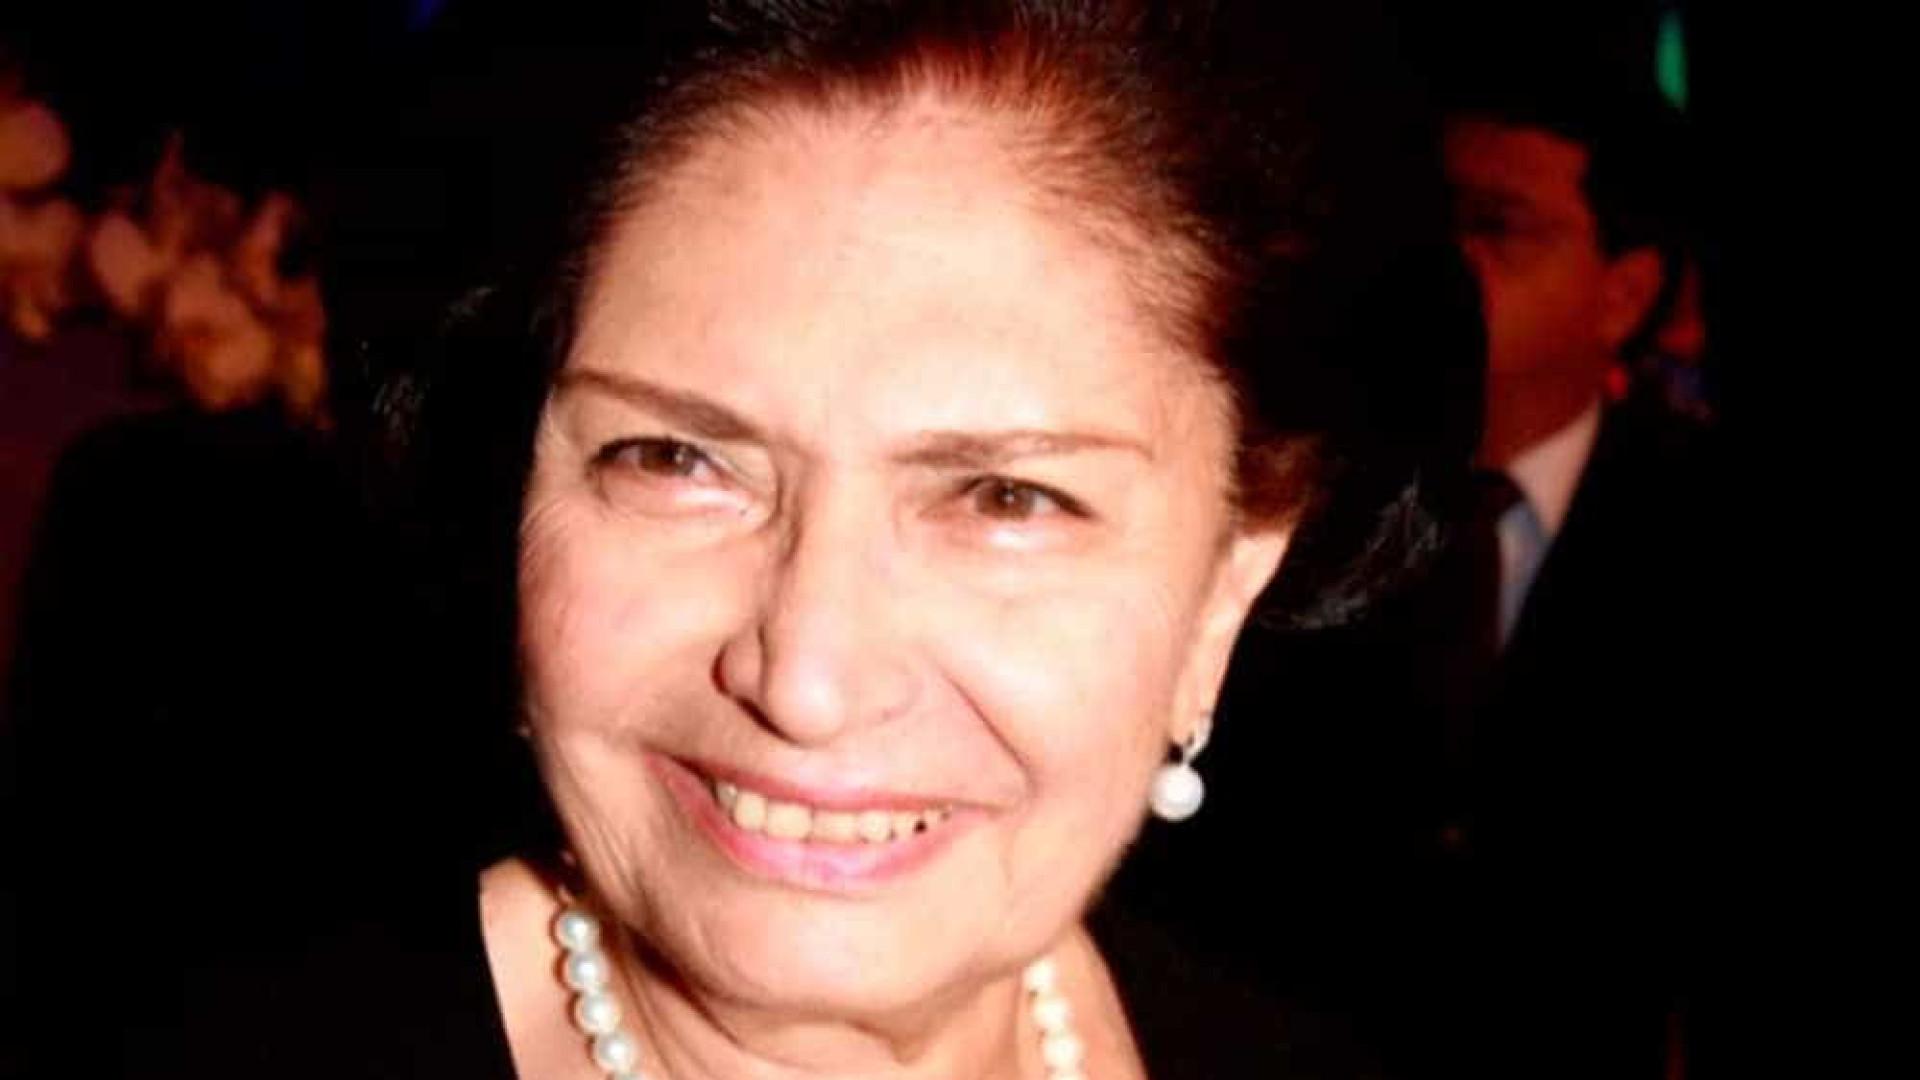 Morre viúva de ACM, Arlette Magalhães, aos 86 anos